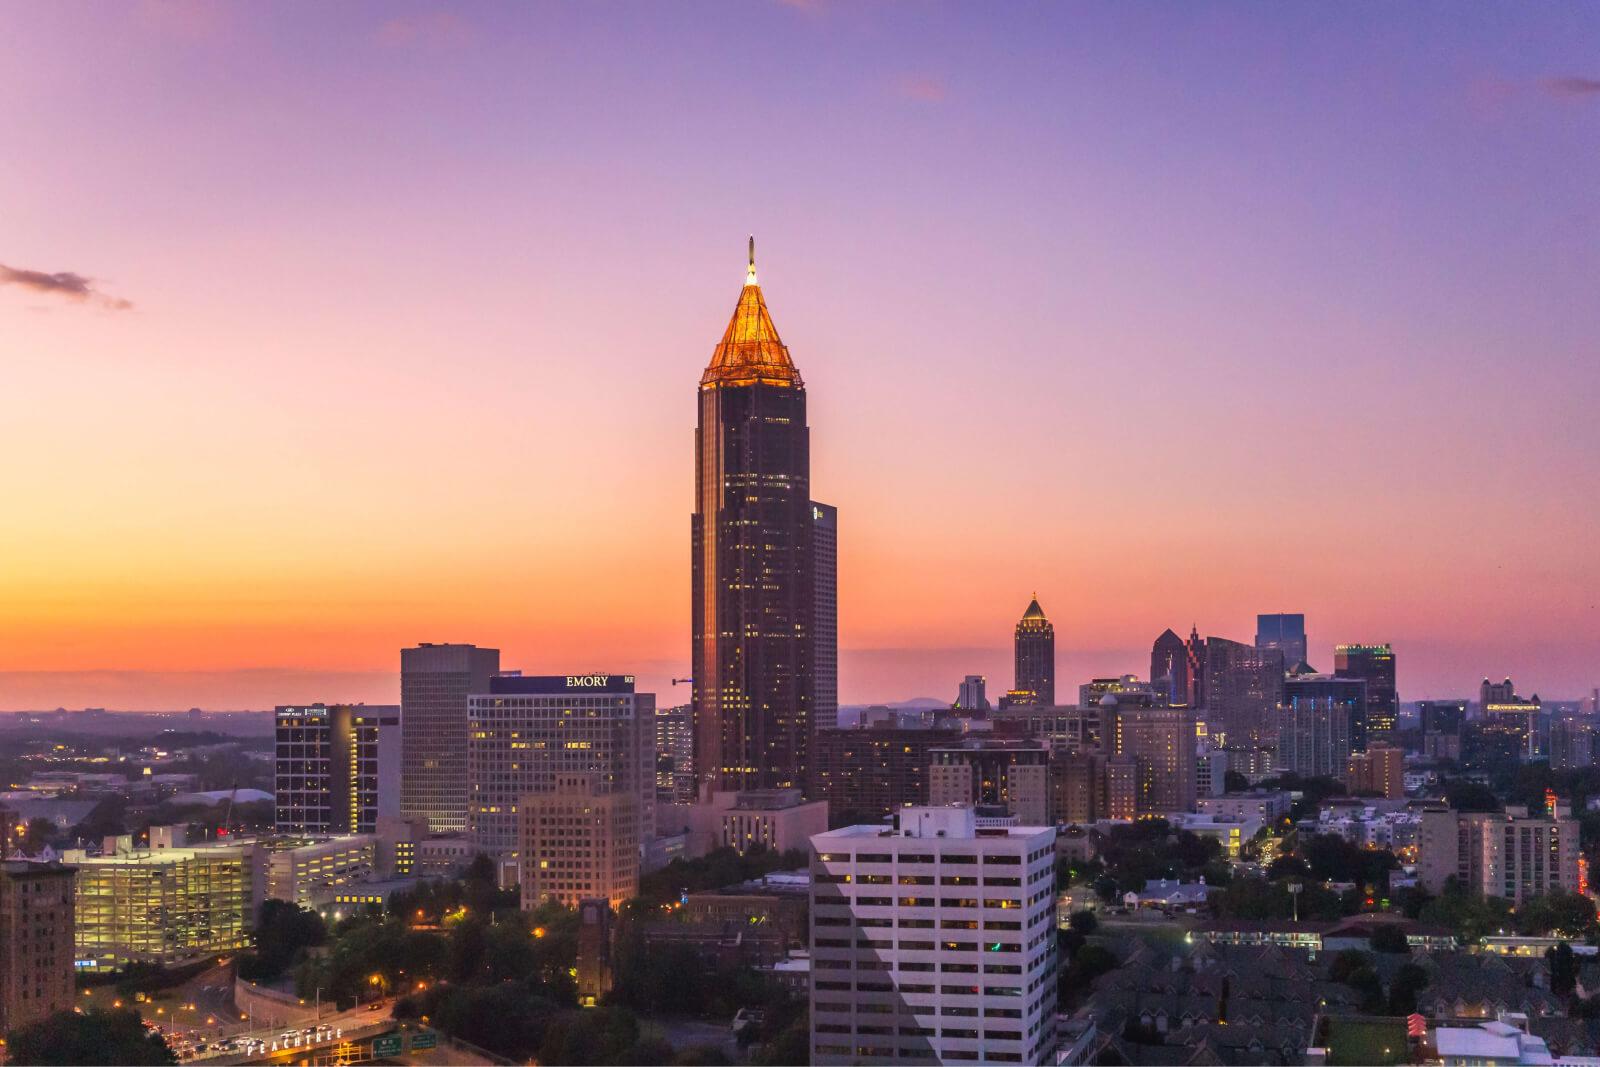 Skyline shot of Atlanta, Georgia